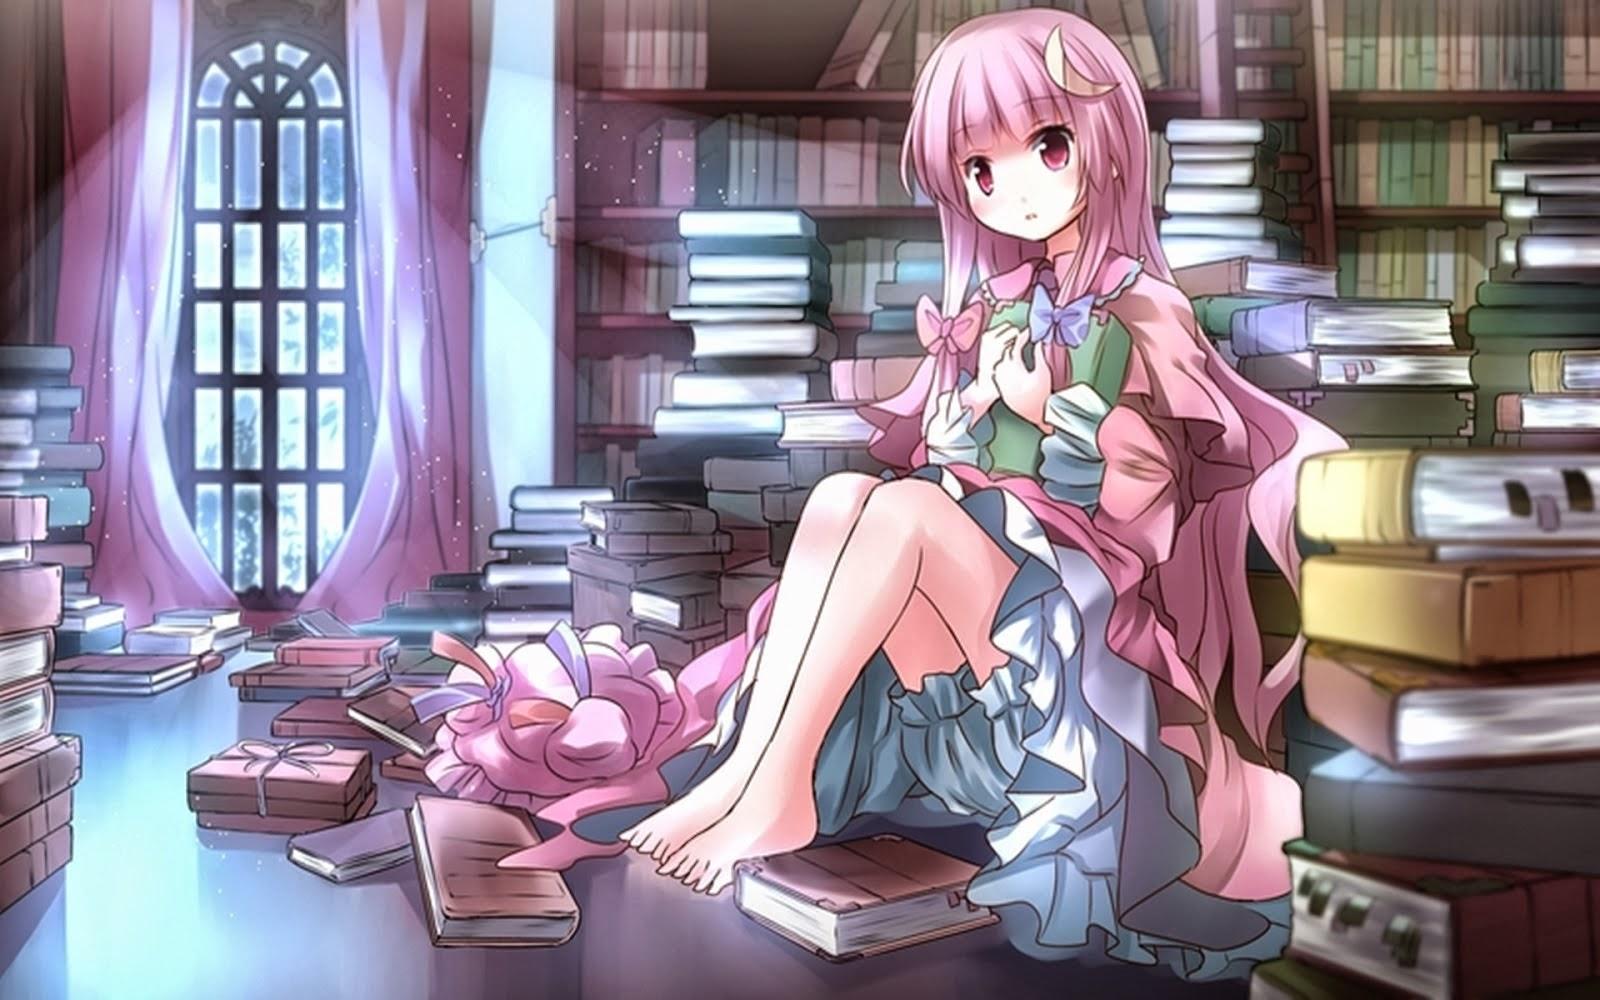 Wallpaper Of Lonely Girl In Rain Sad Anime Girl Facebook Cover I M So Lonely